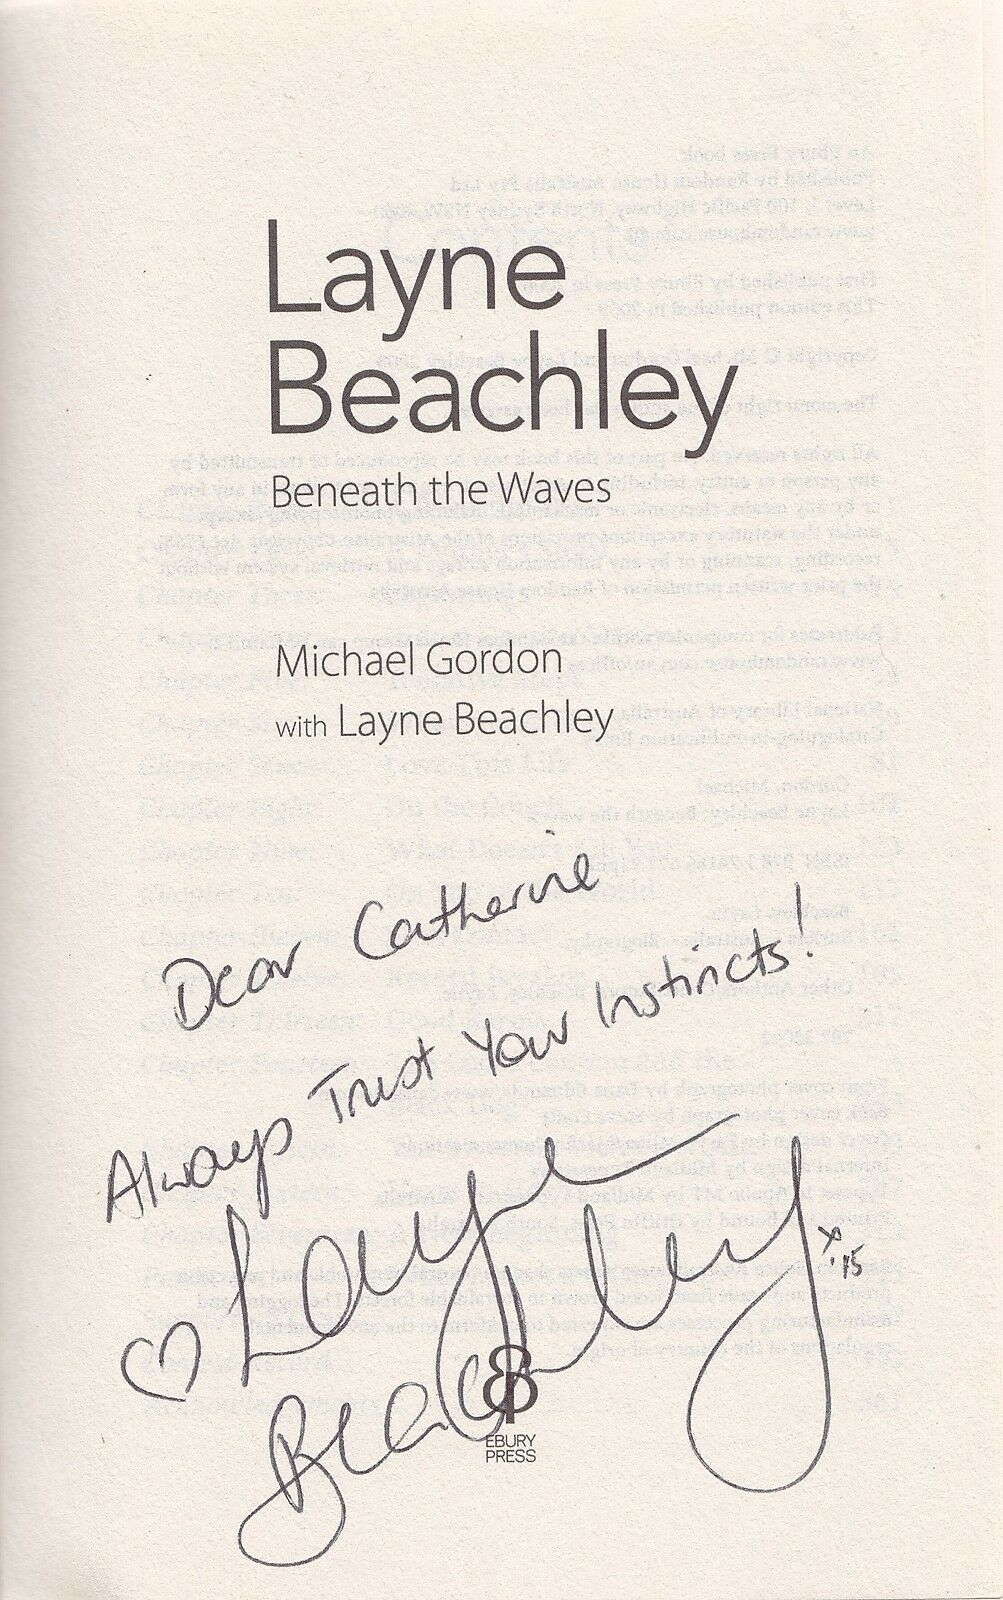 LAYNE BEACHLEY AUSTRALIAN SURFER BENEATH THE WAVES RARE SIGNED BOOK COA